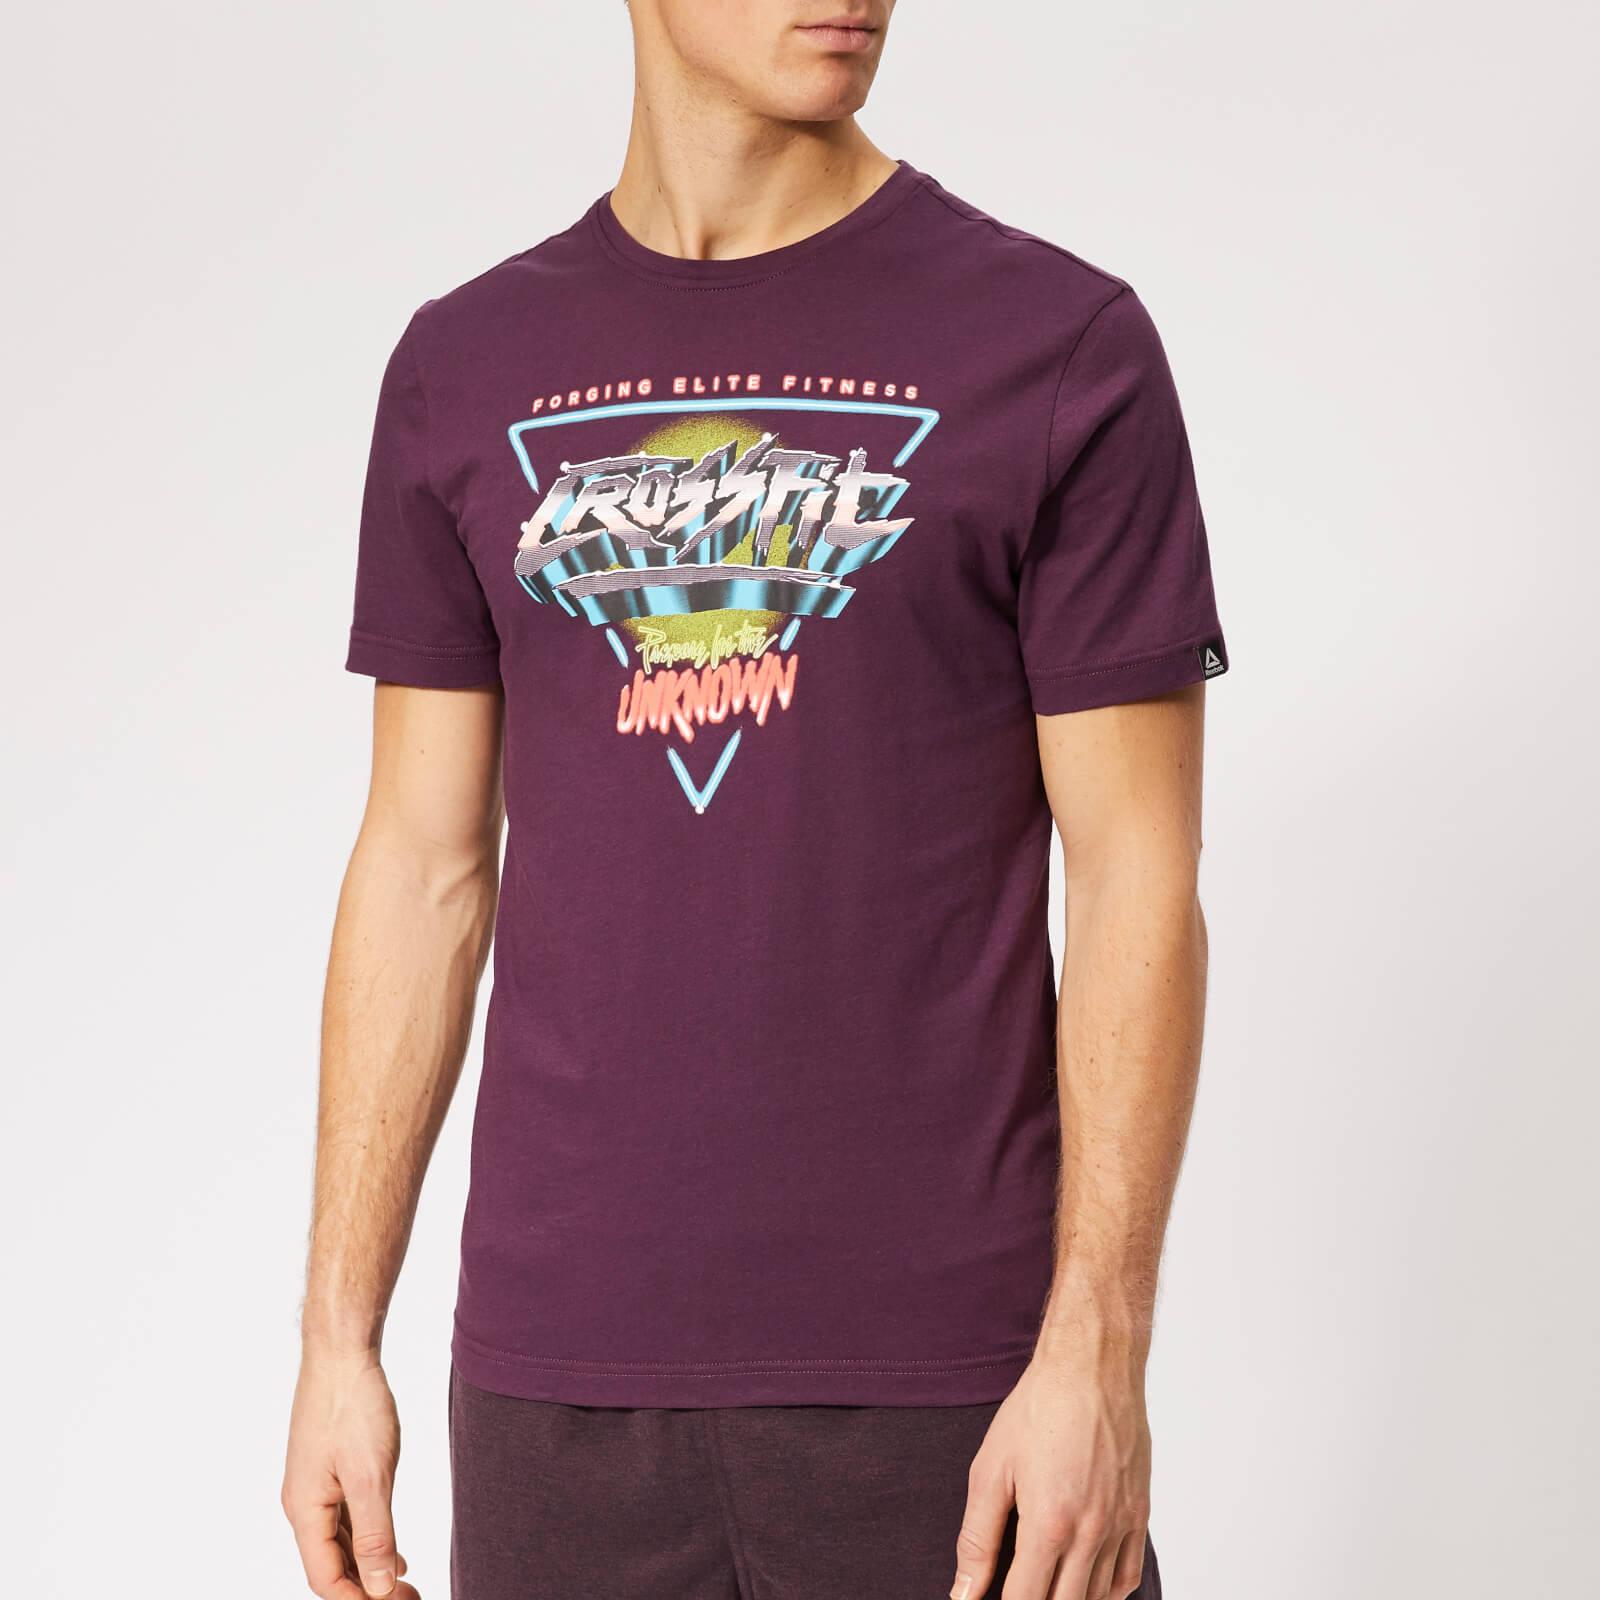 Reebok Men's Crossfit Neon Retro Short Sleeve T-Shirt - Purple - M - Purple